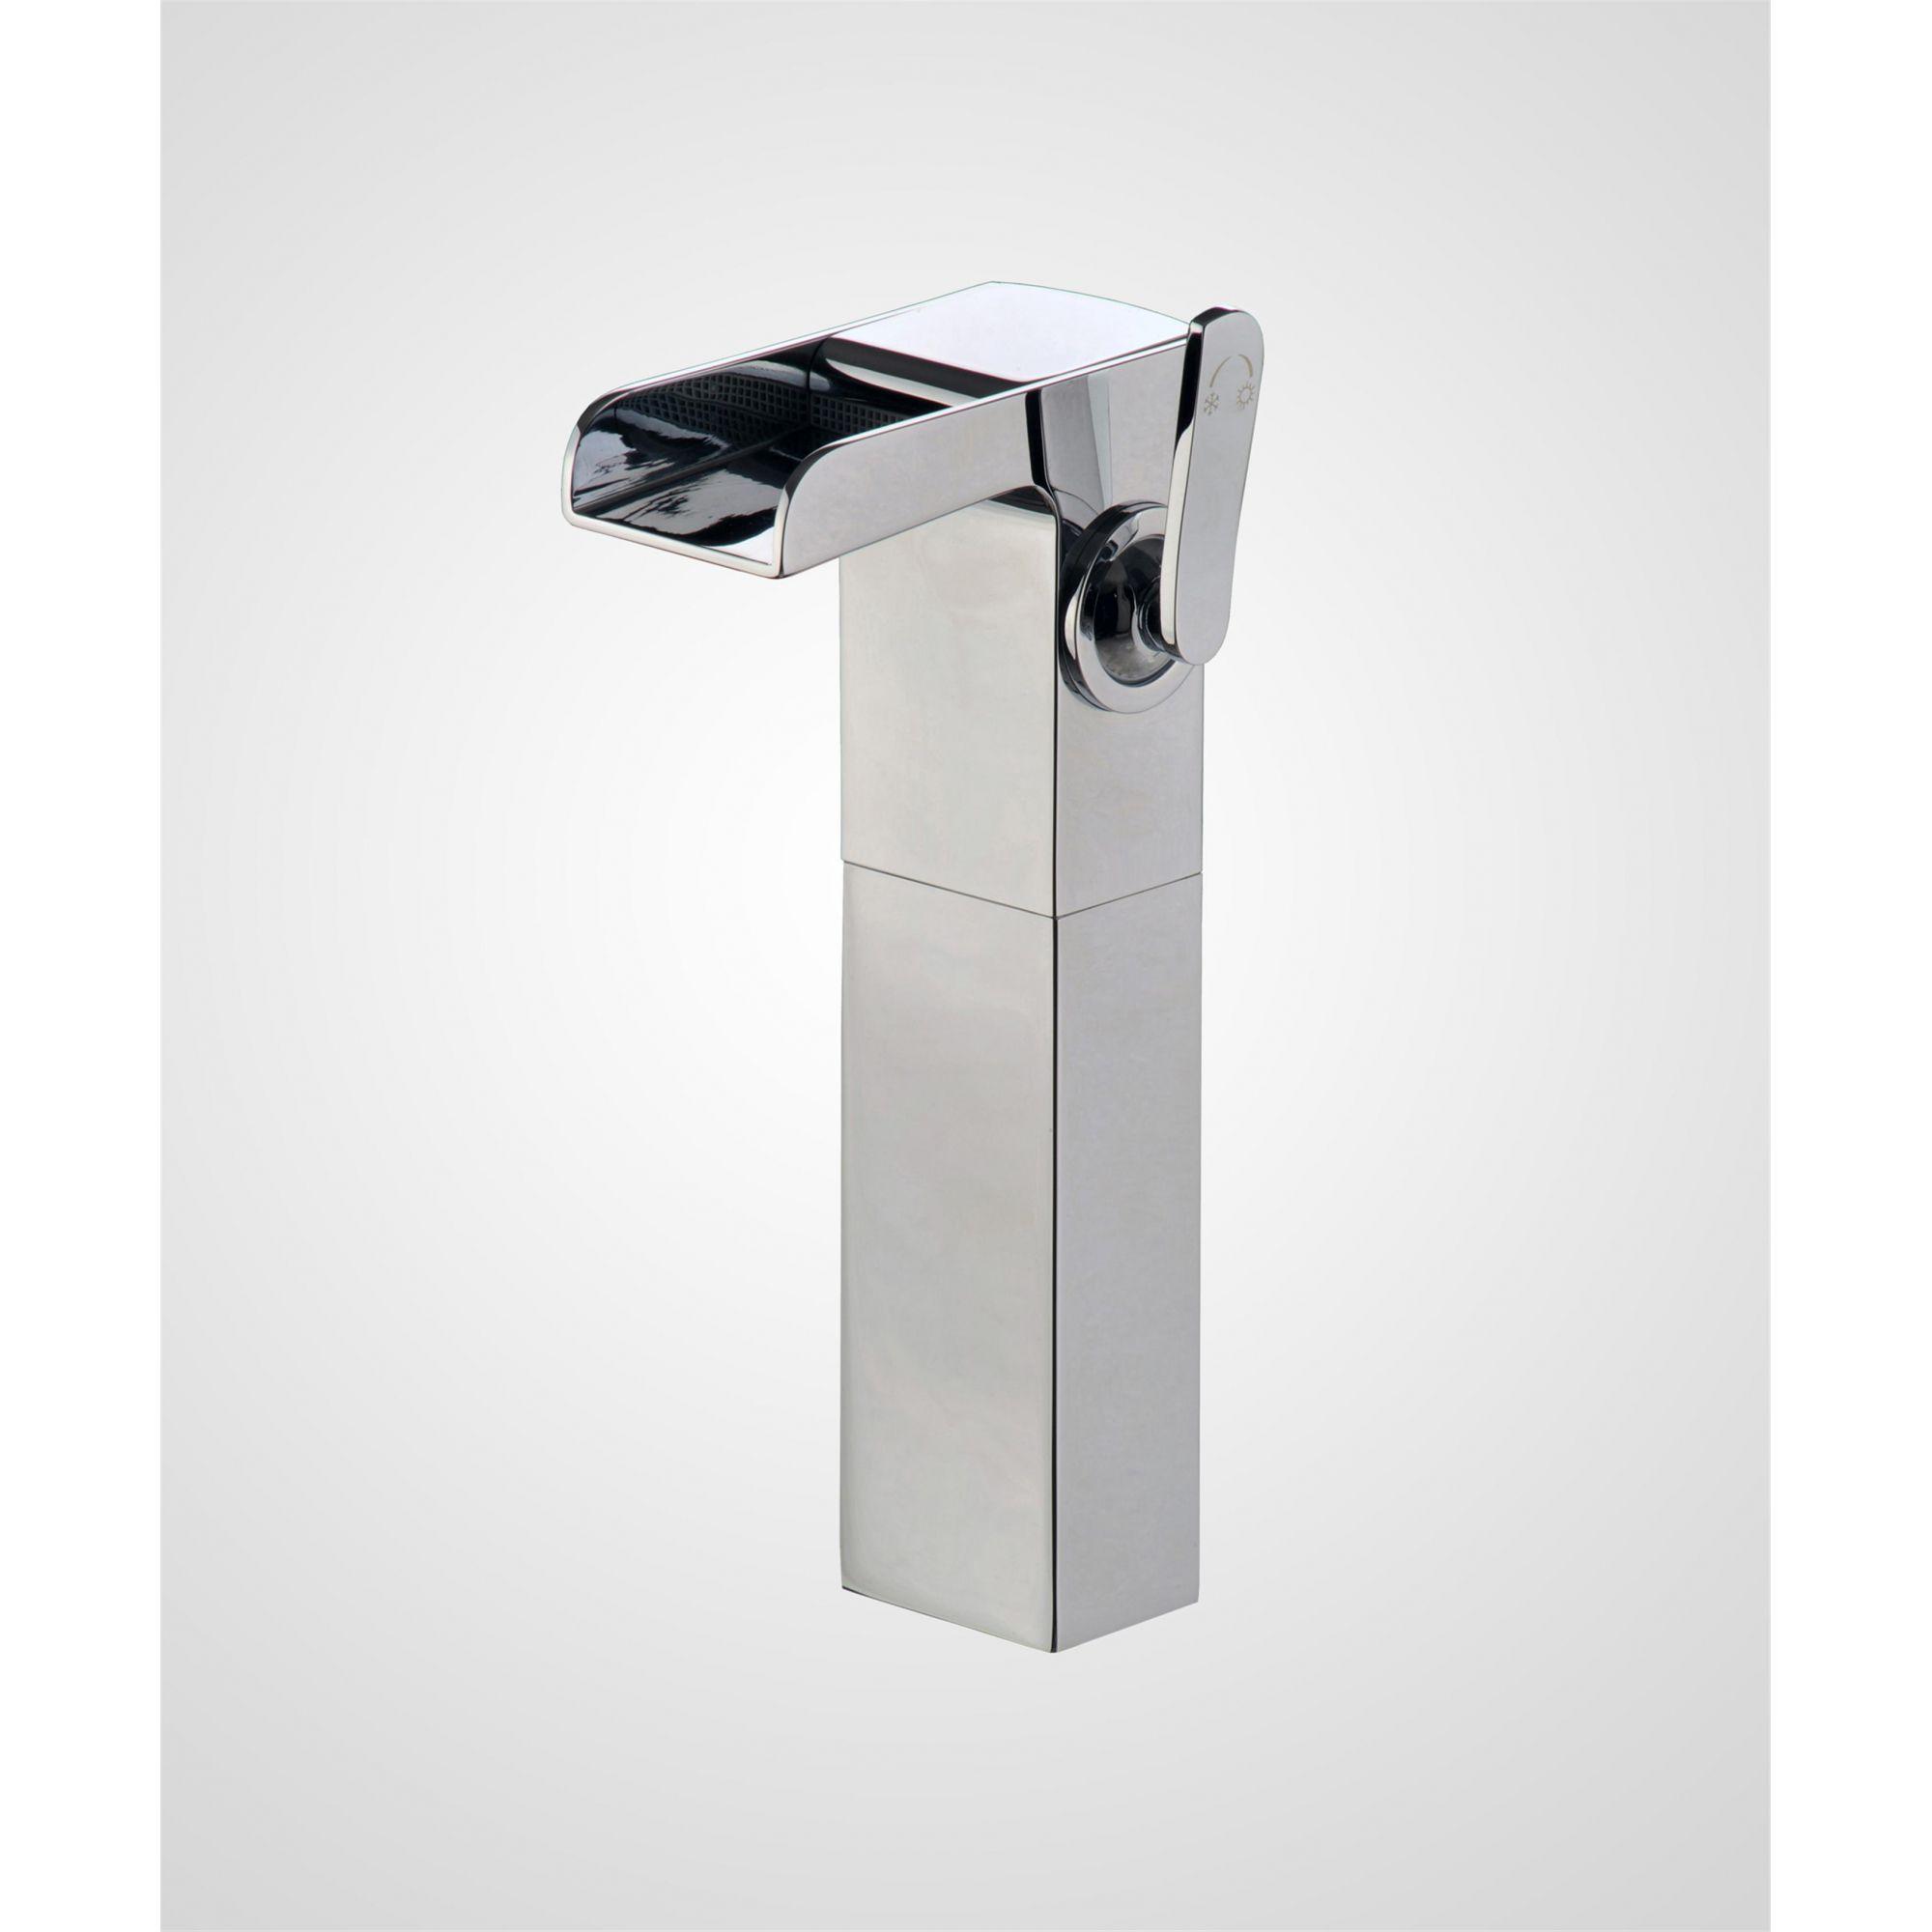 Misturador Monocomando Para Lavatório Ocean C2877 C88 Perflex 10735510